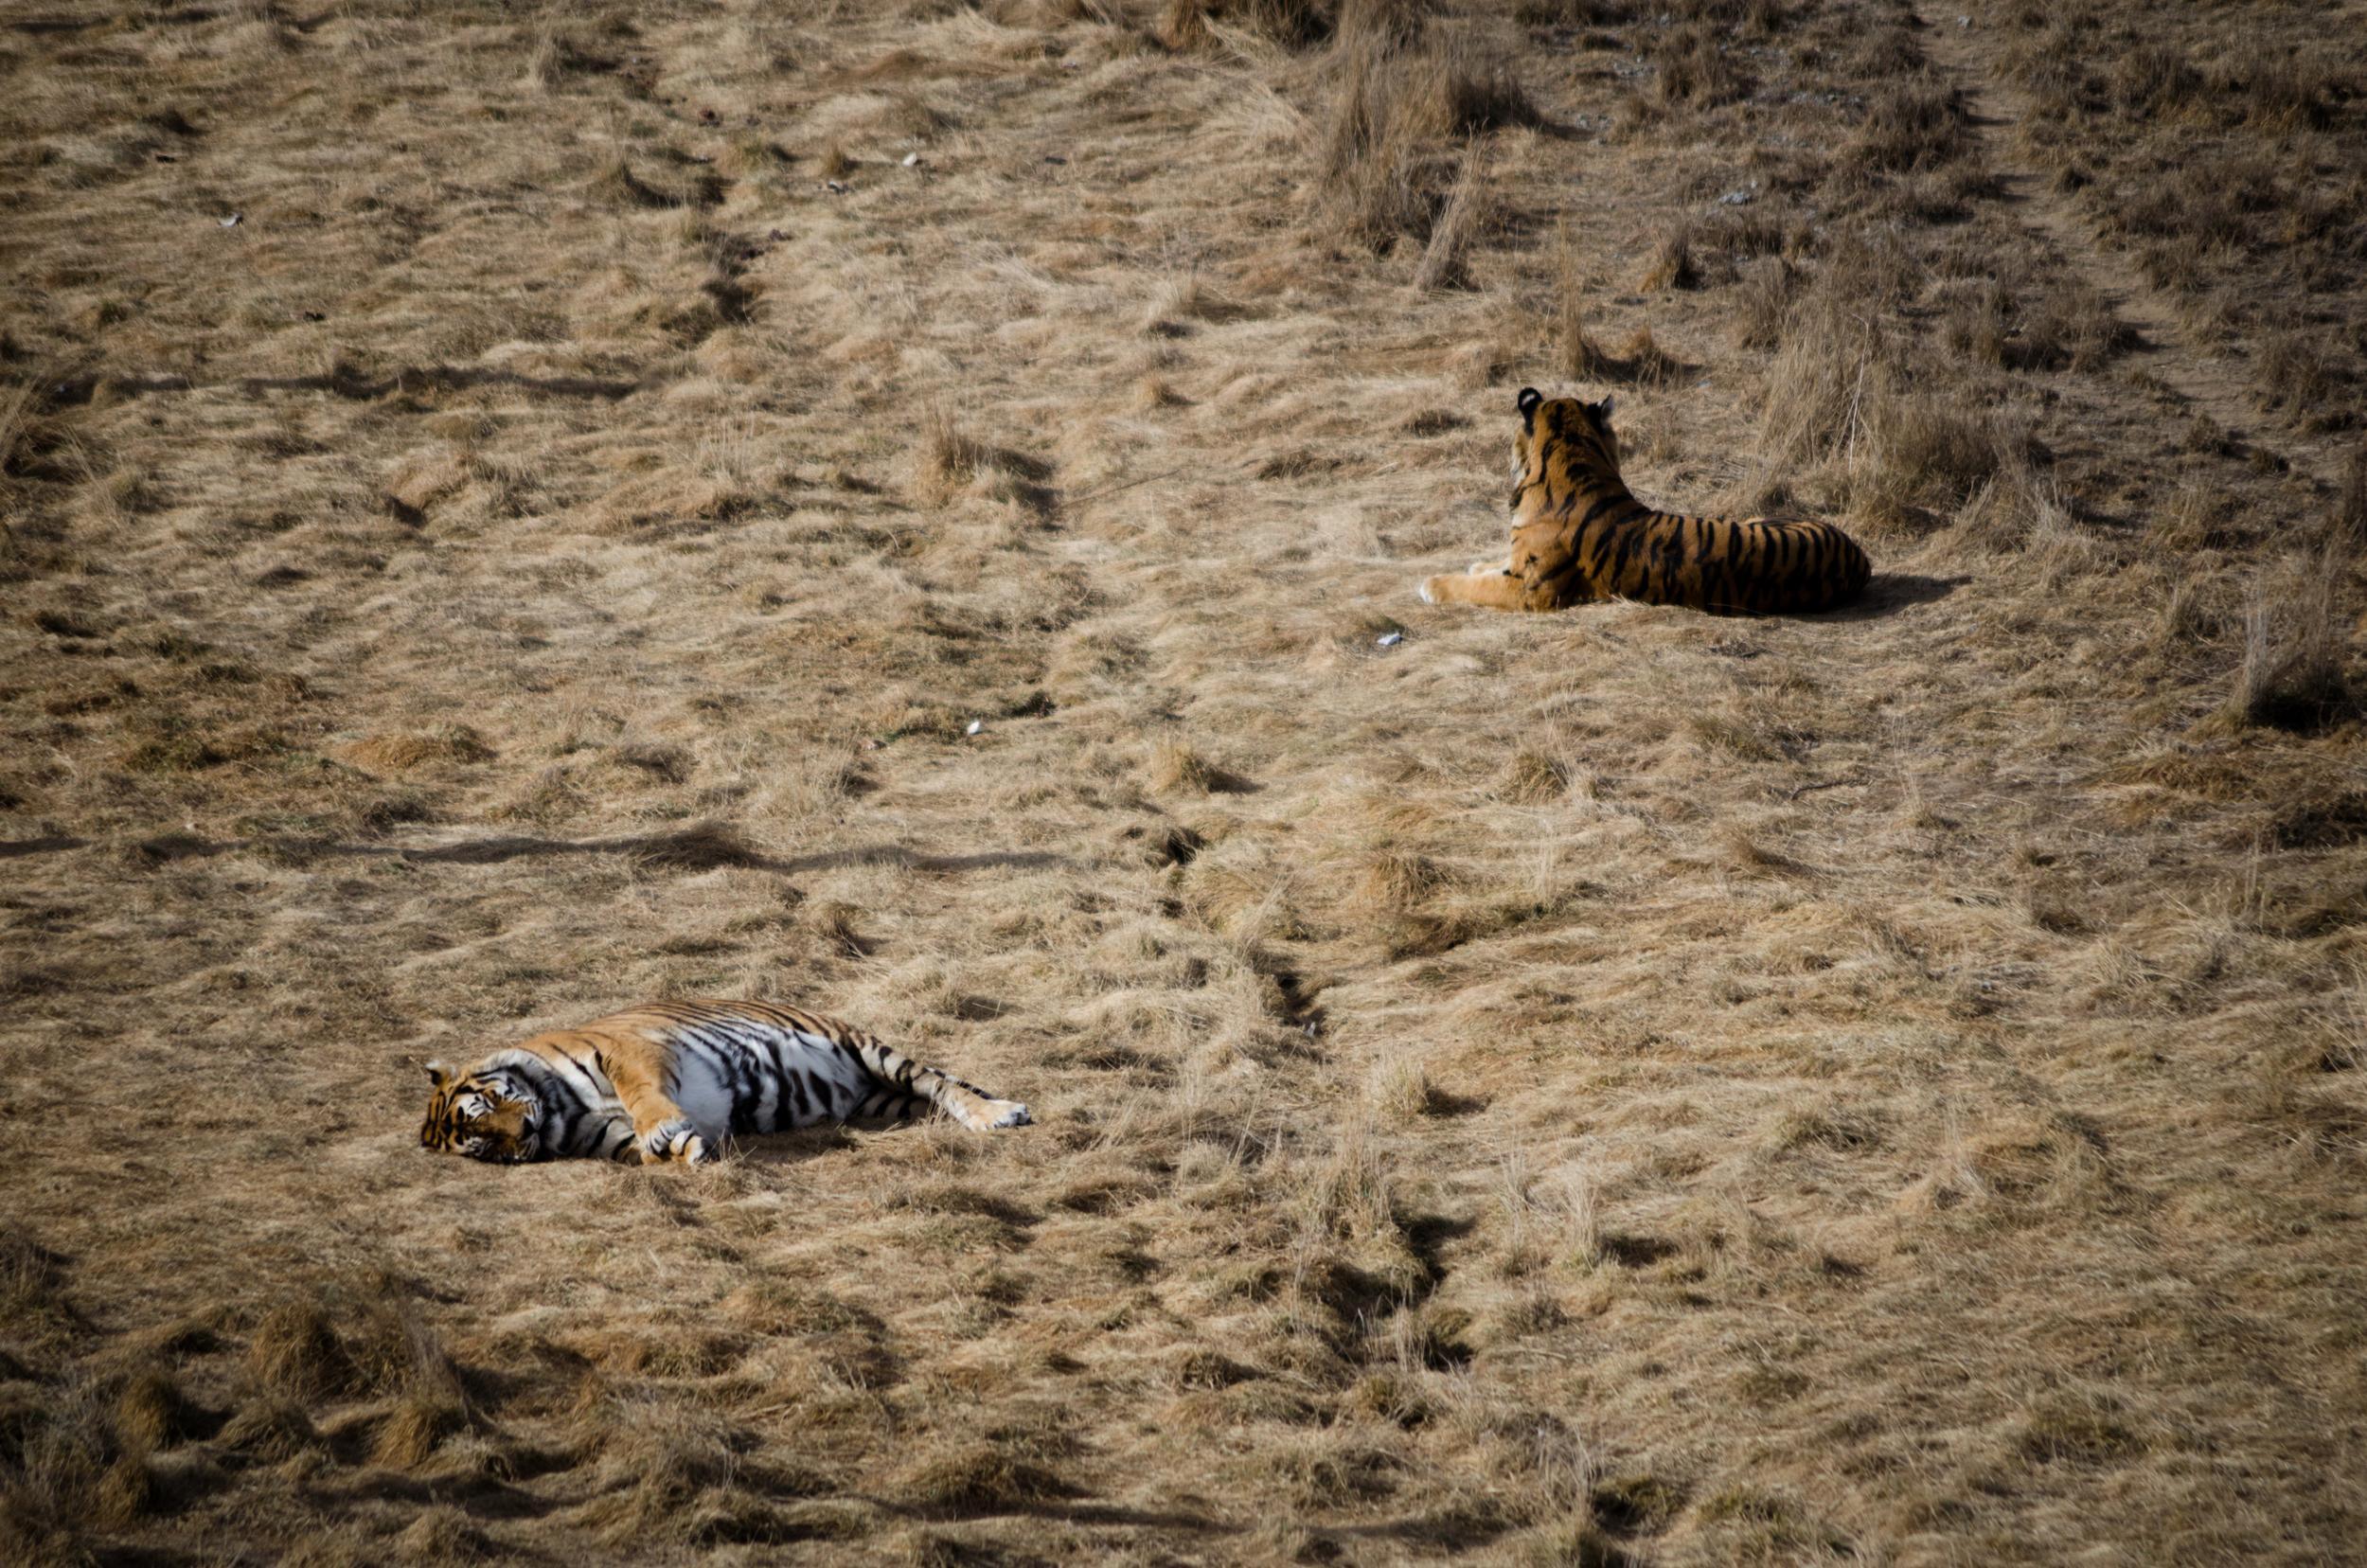 Tigers at Colorado Wild Animal Sanctuary 2015